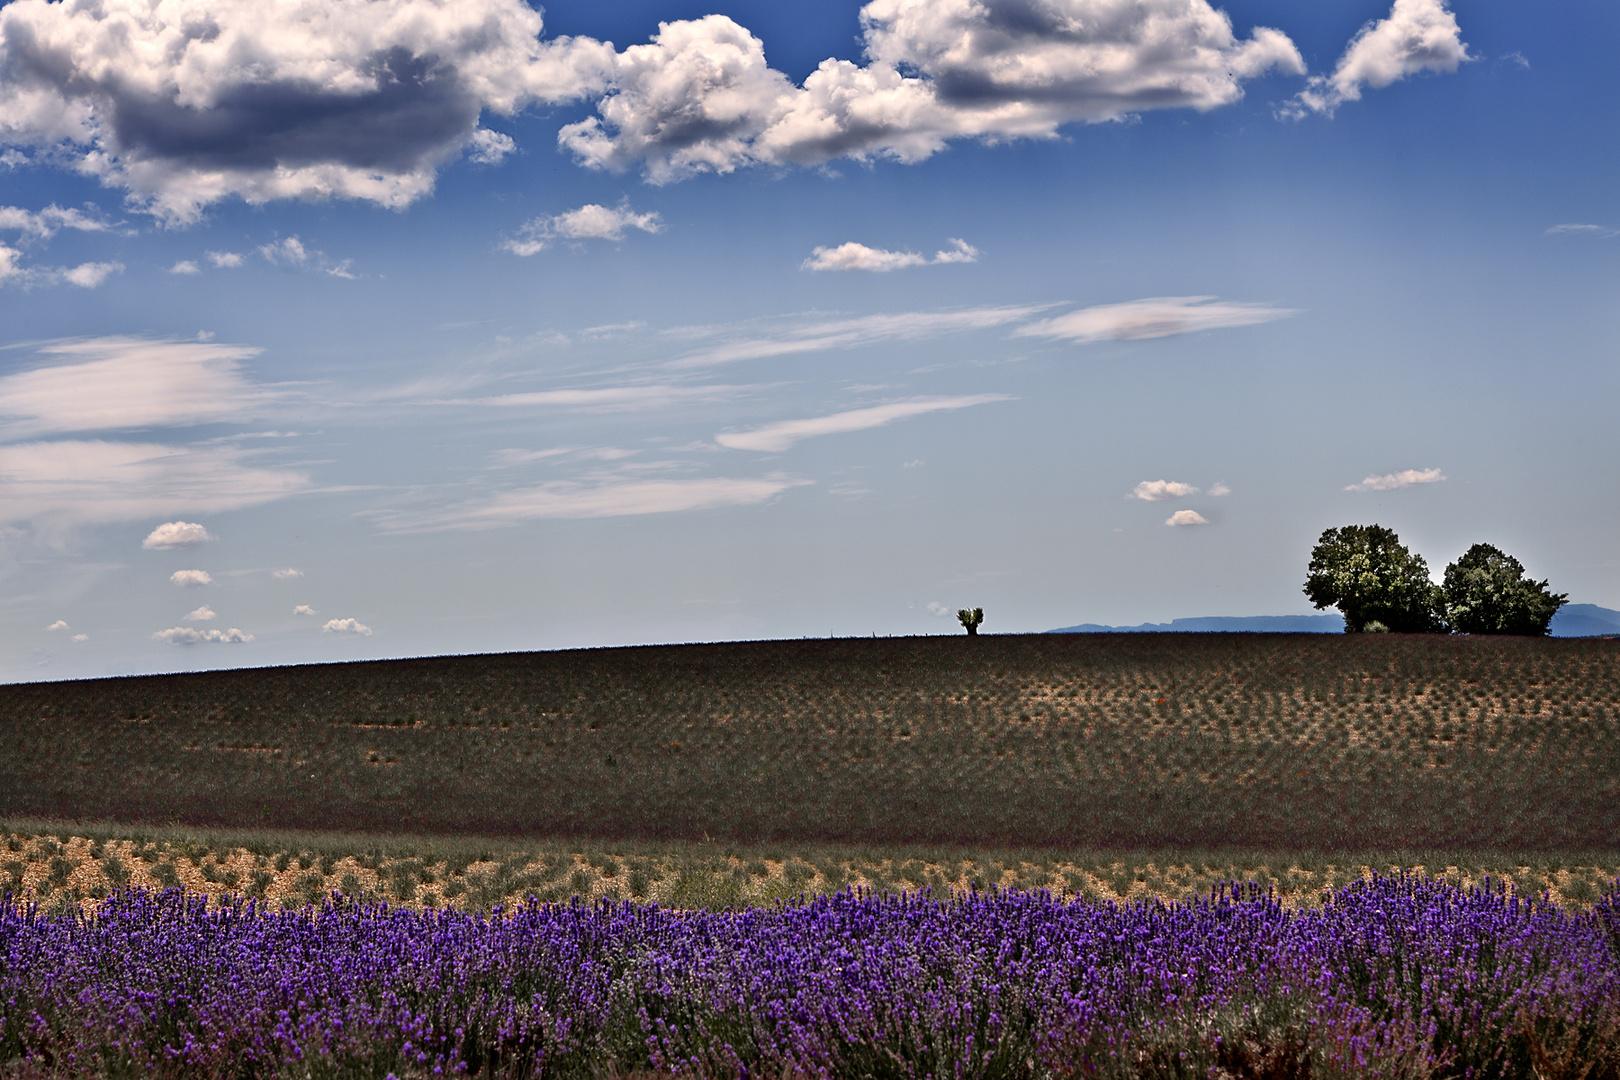 Im Lavendelland III